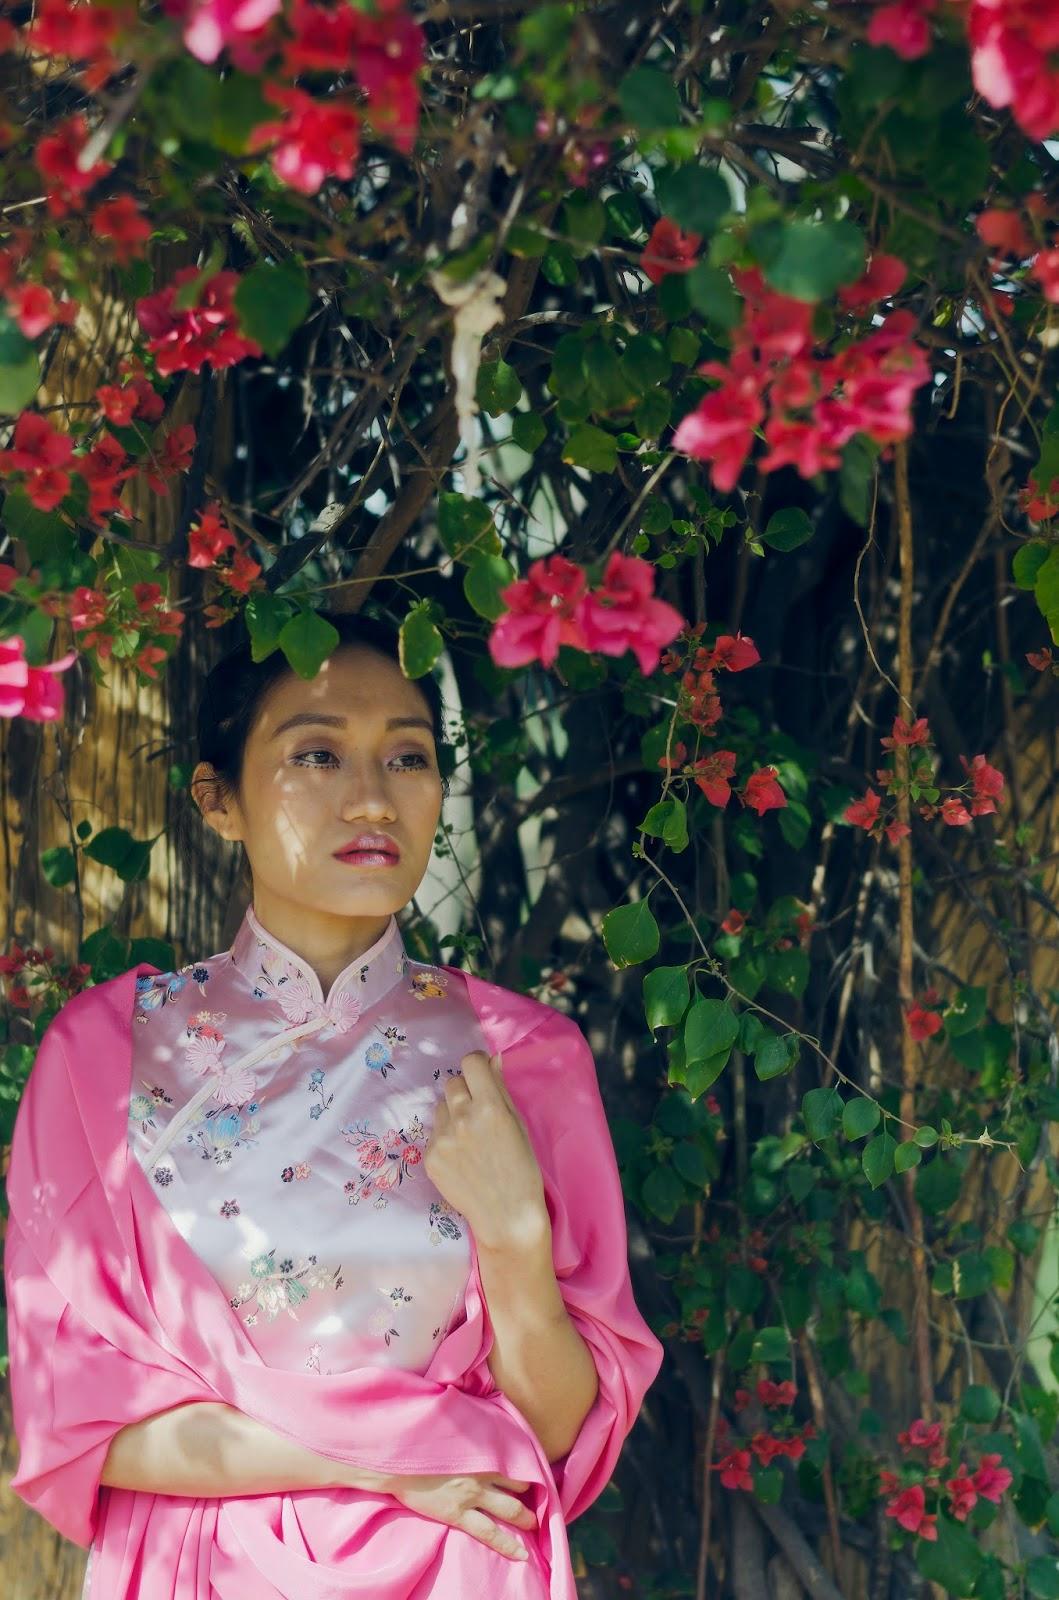 March, Spring, SS15, Flowers, Chinese Dress, Qipao Cheongsam, Silk